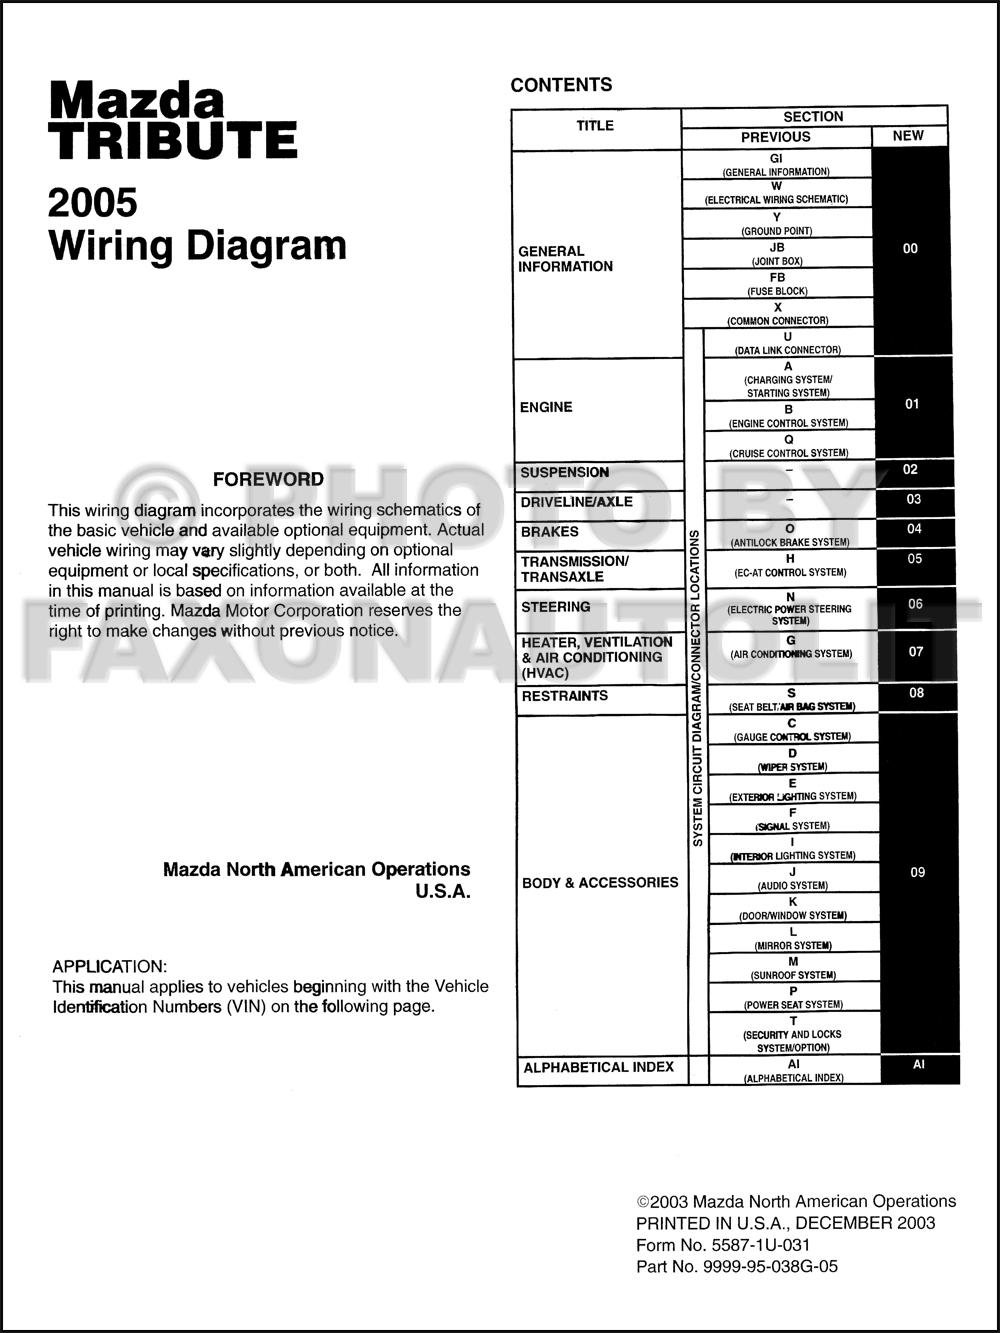 2005 mazda tribute wiring diagram